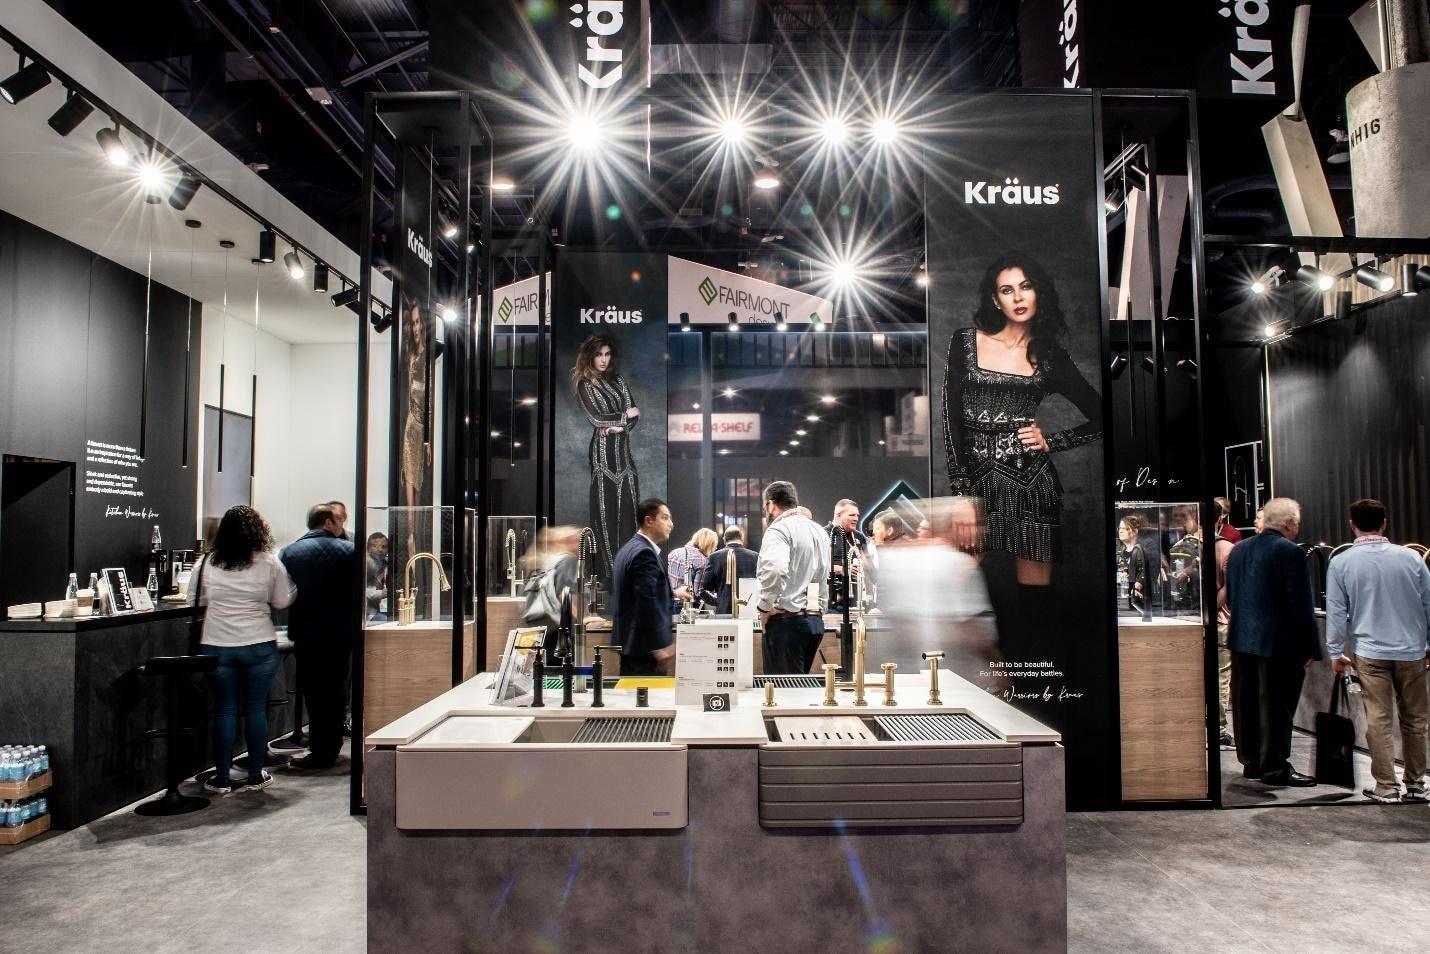 kraus-kbis-2020-granite-sinks-in-booth